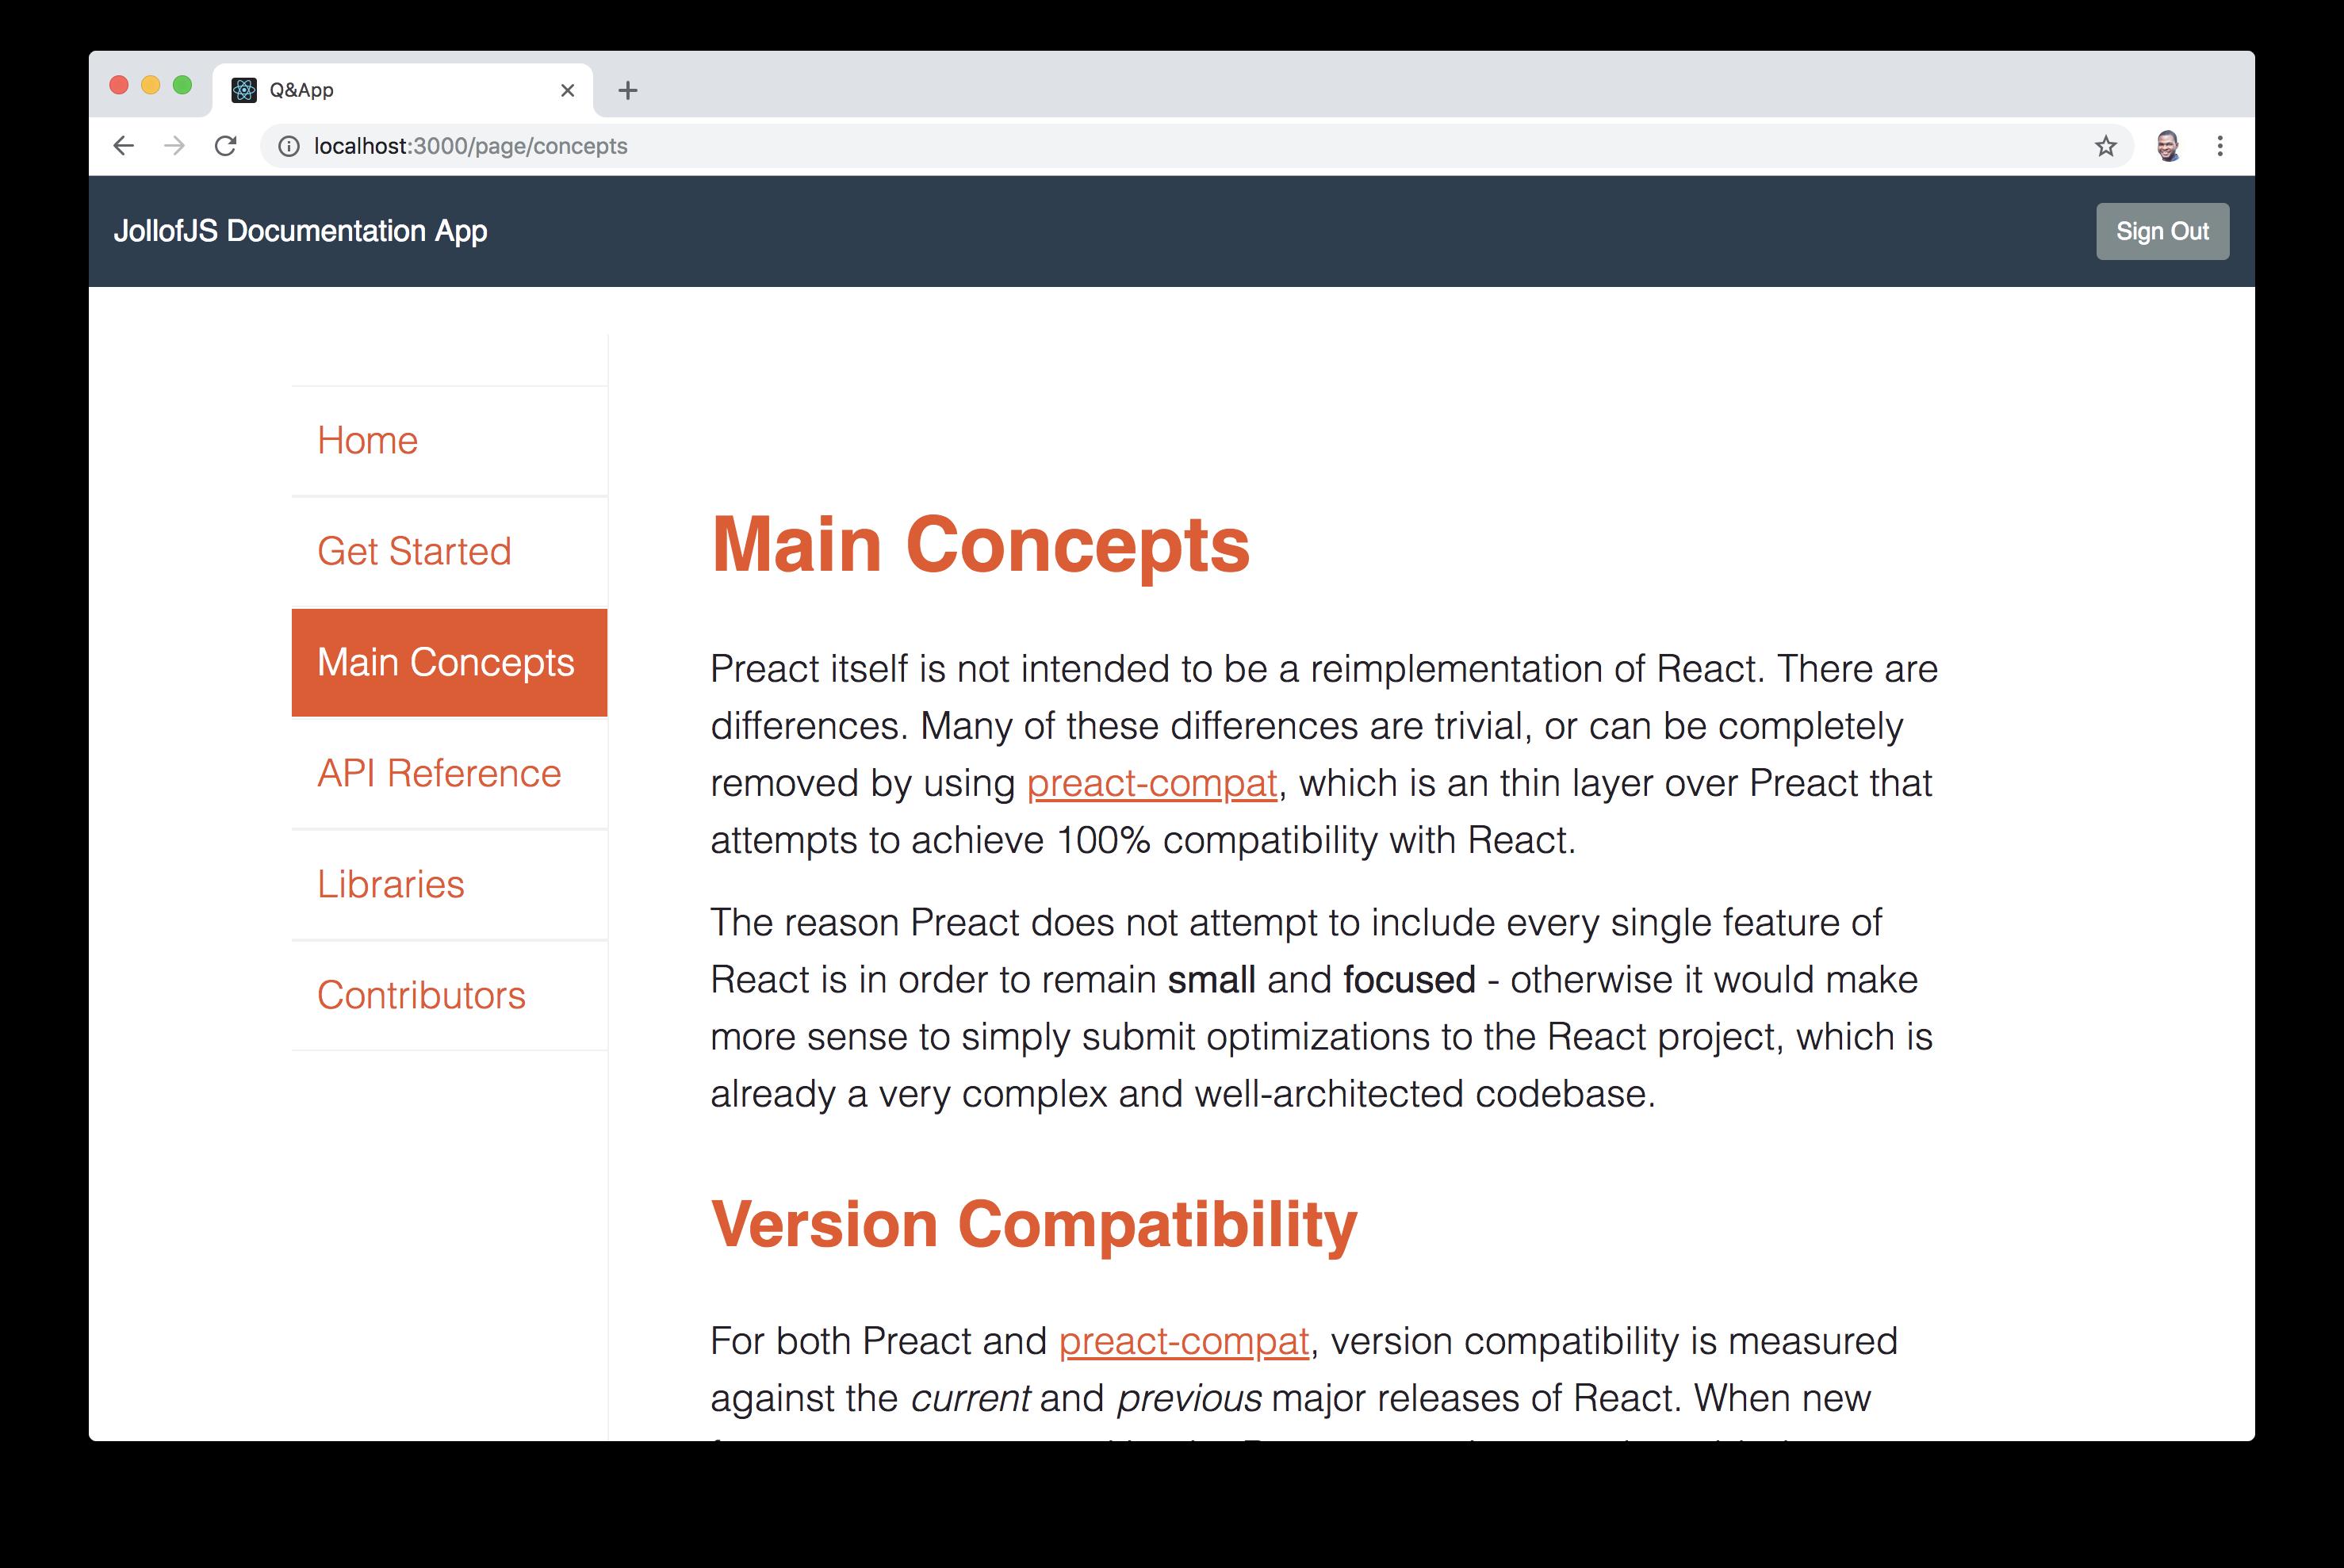 Documentation App navigation - Main concepts